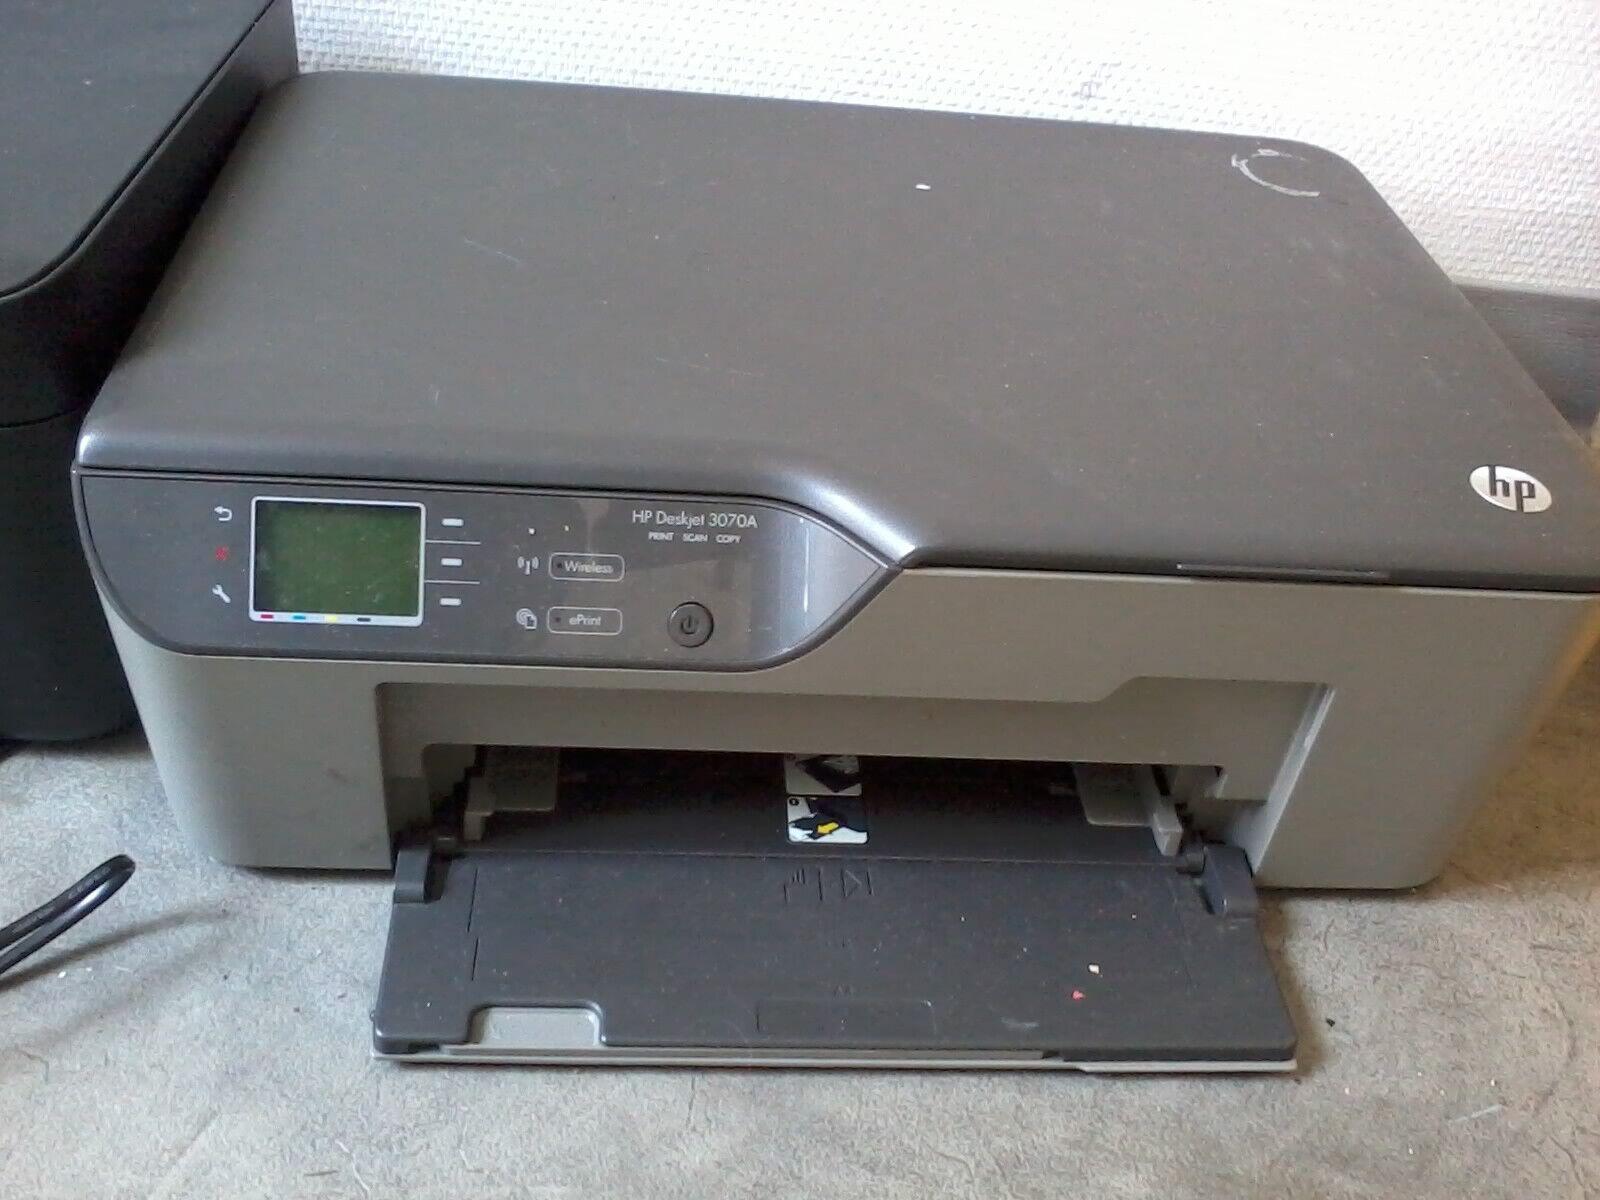 Imprimante pc hp deskjet 3070a